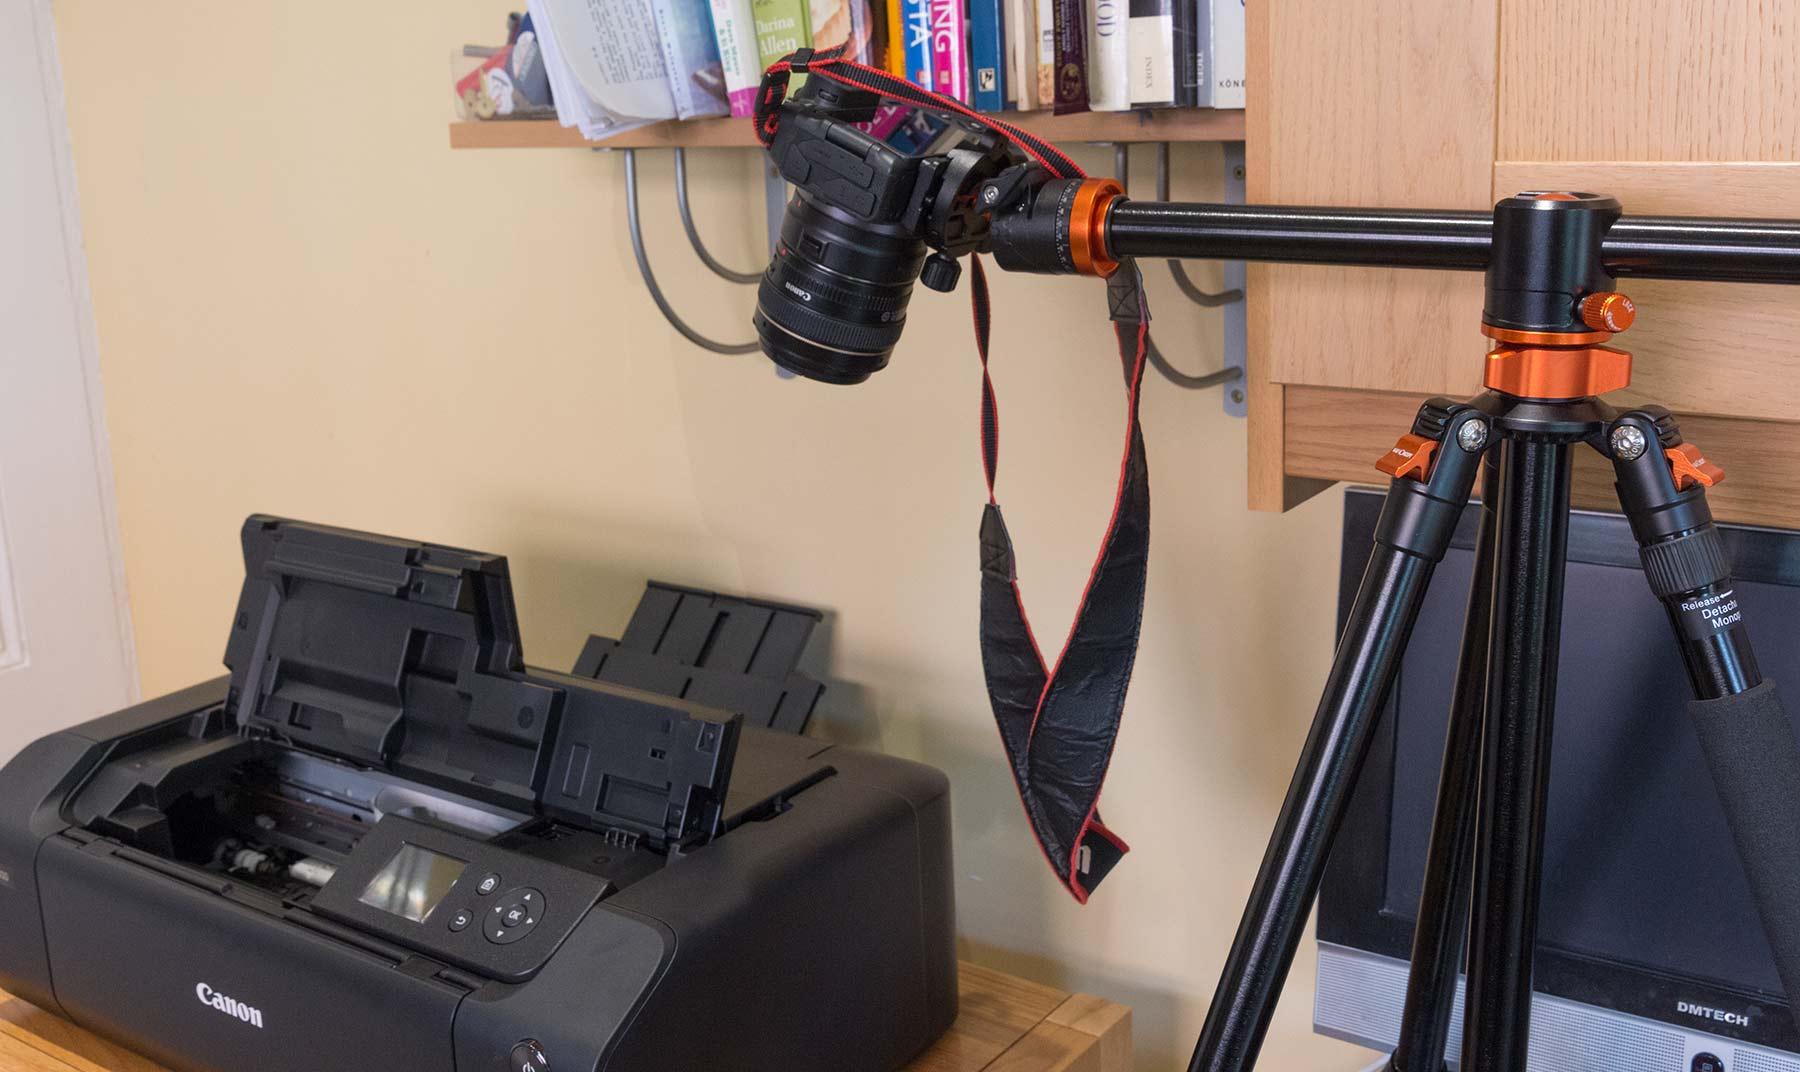 printer-photo-setup